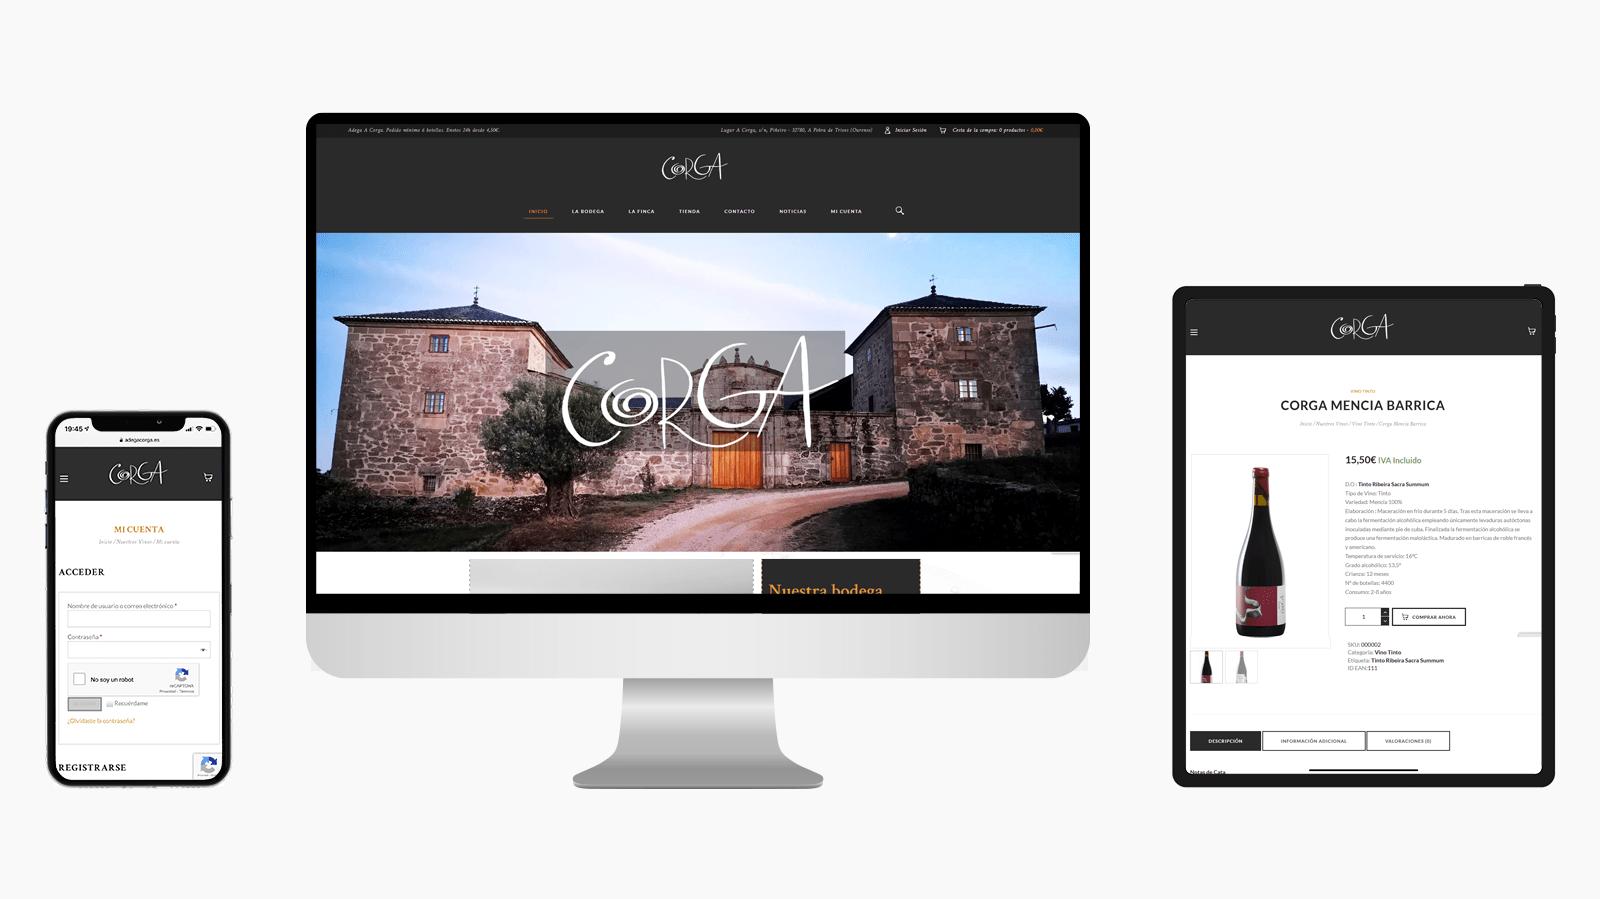 Diseño tienda online Adega A Corga